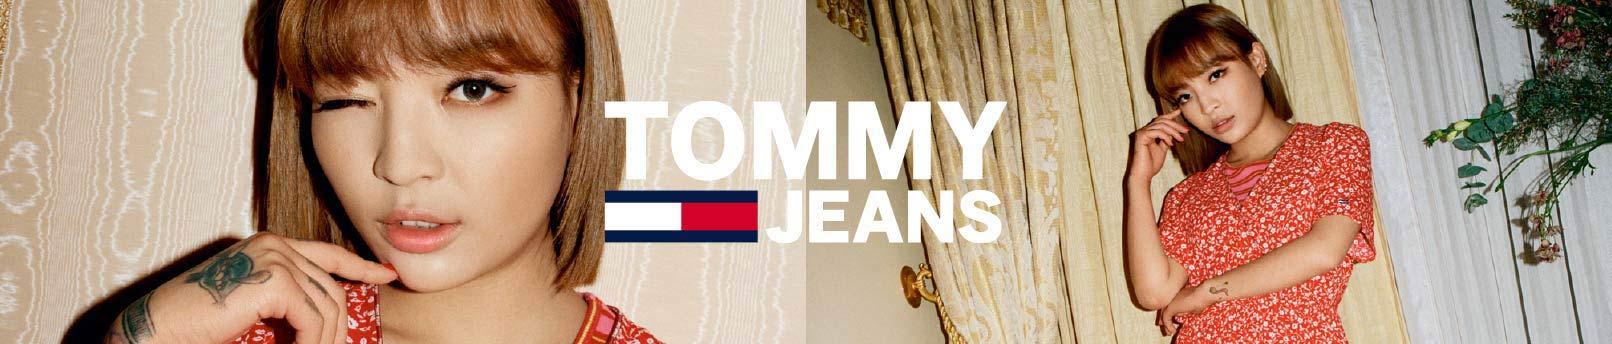 Odkryj Tommy Jeans